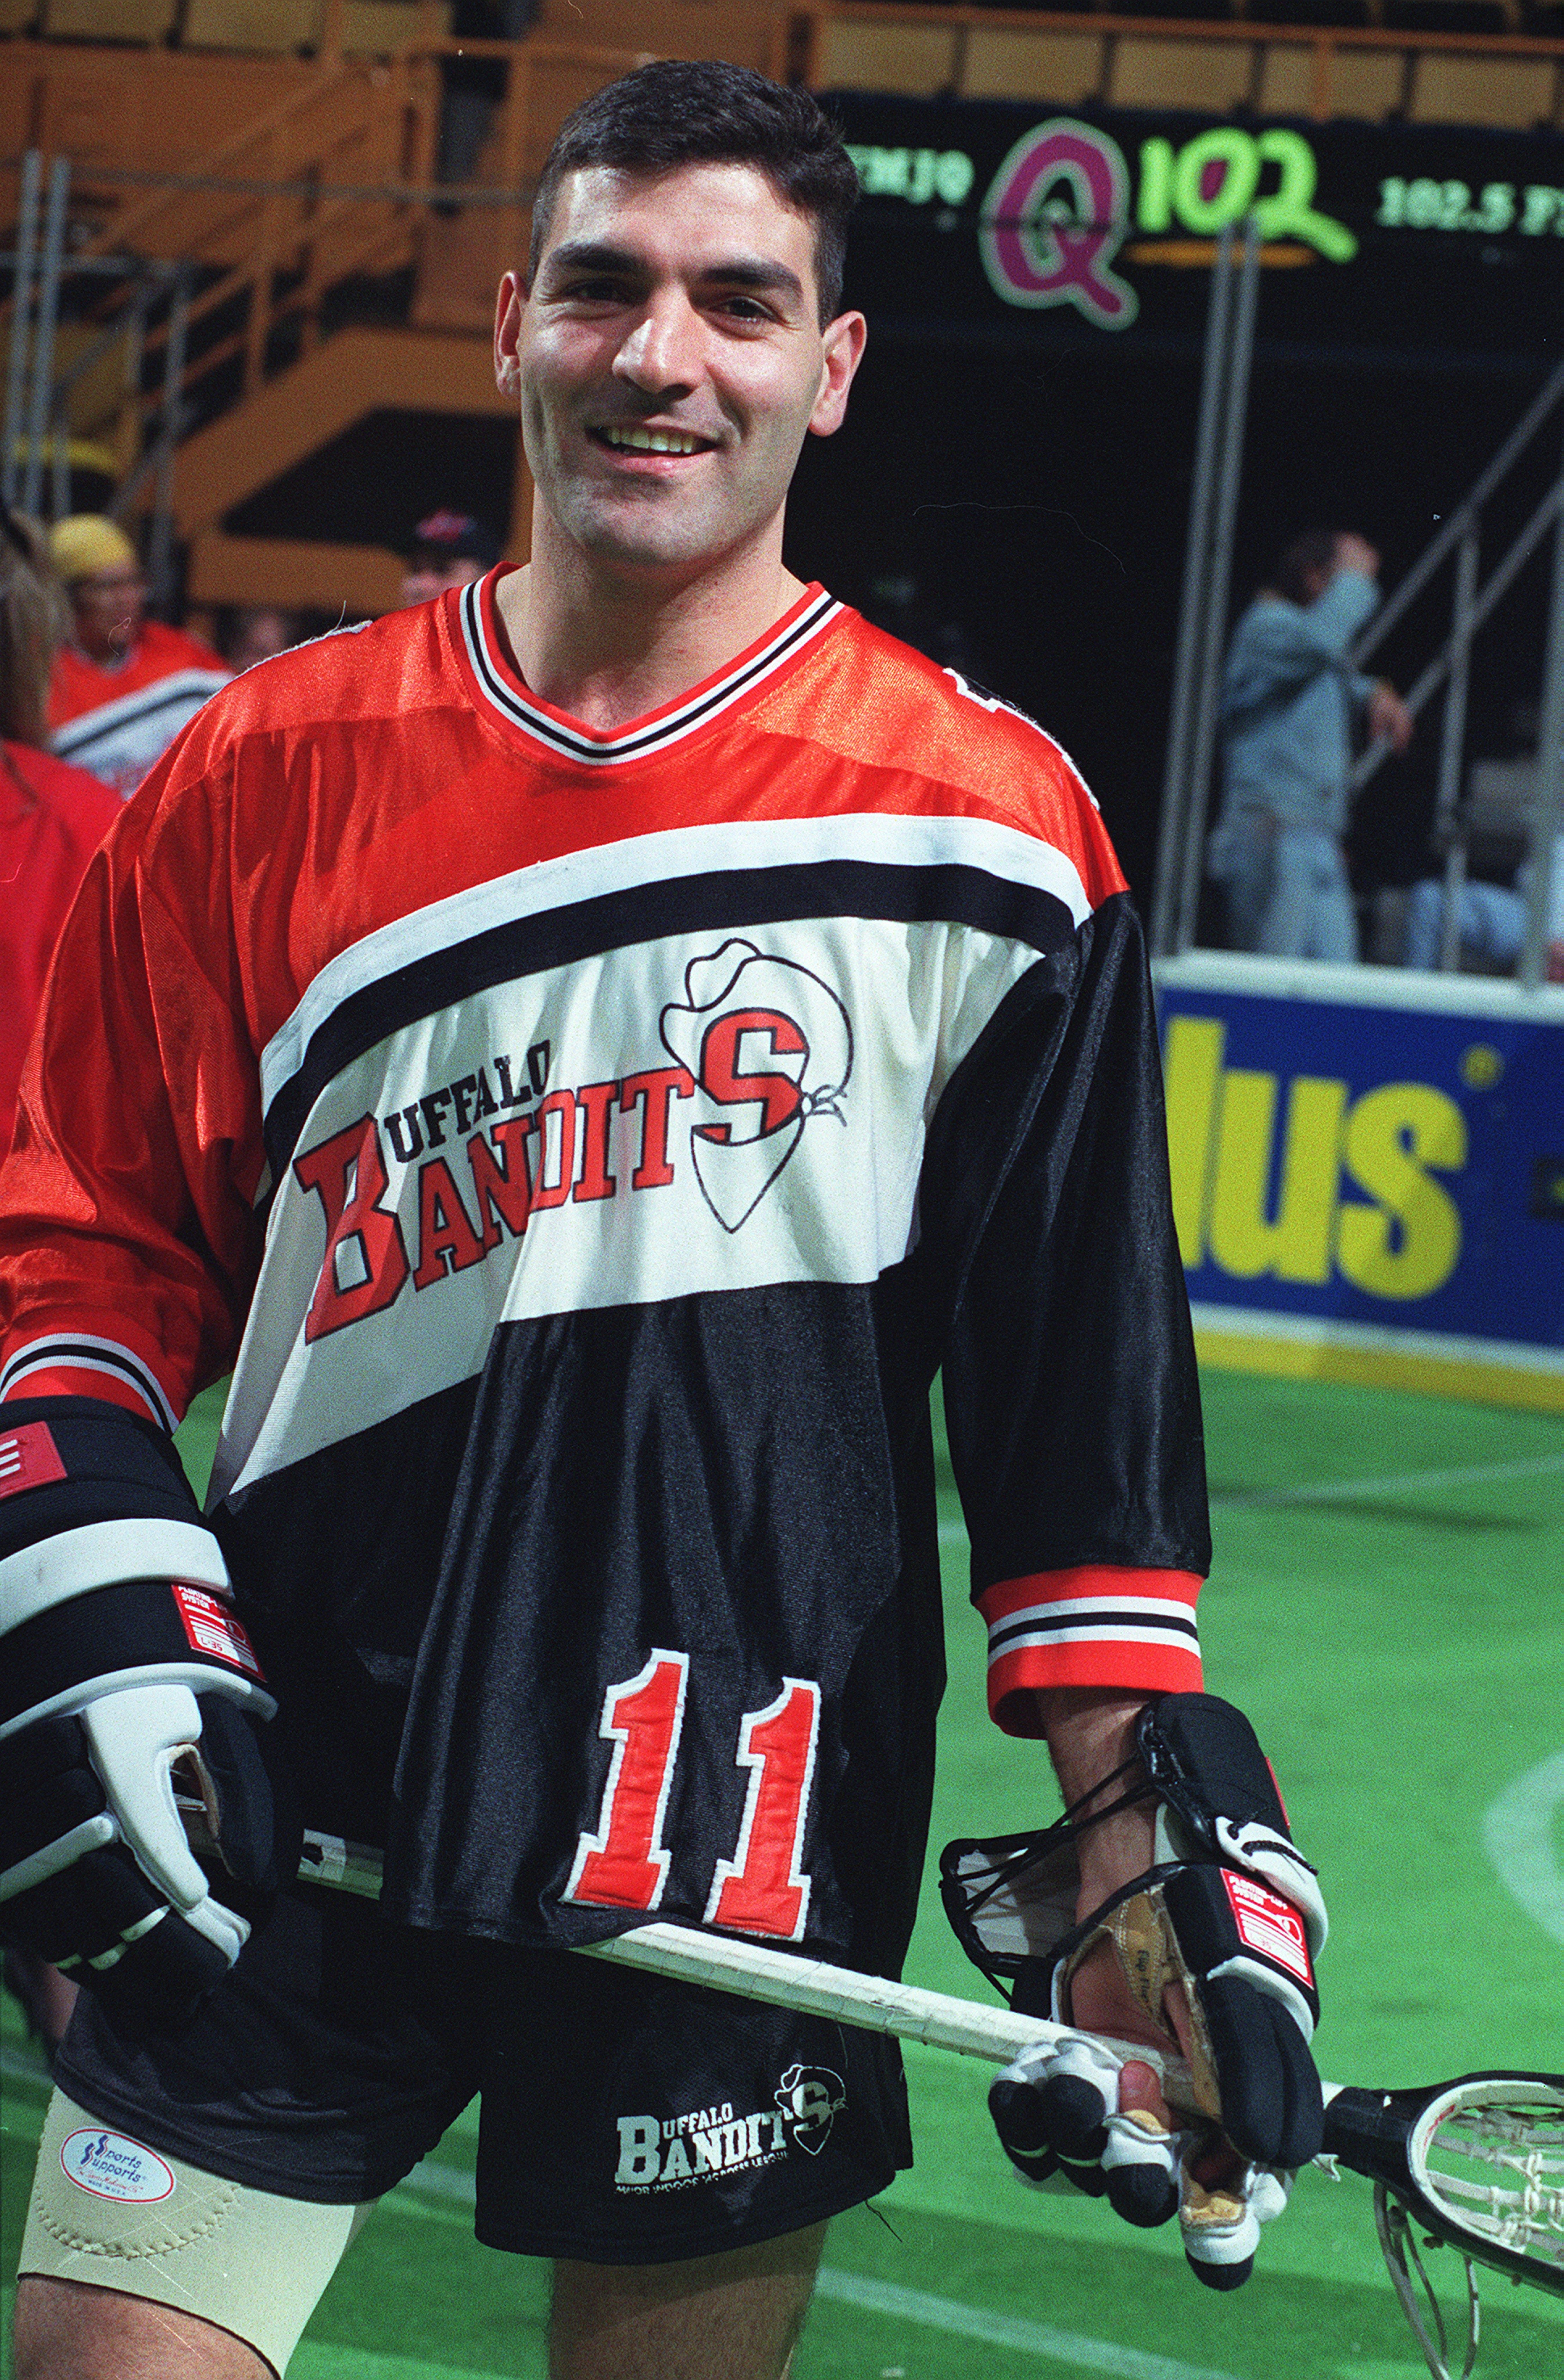 John Tavares was MVP of the 1993 championship game.